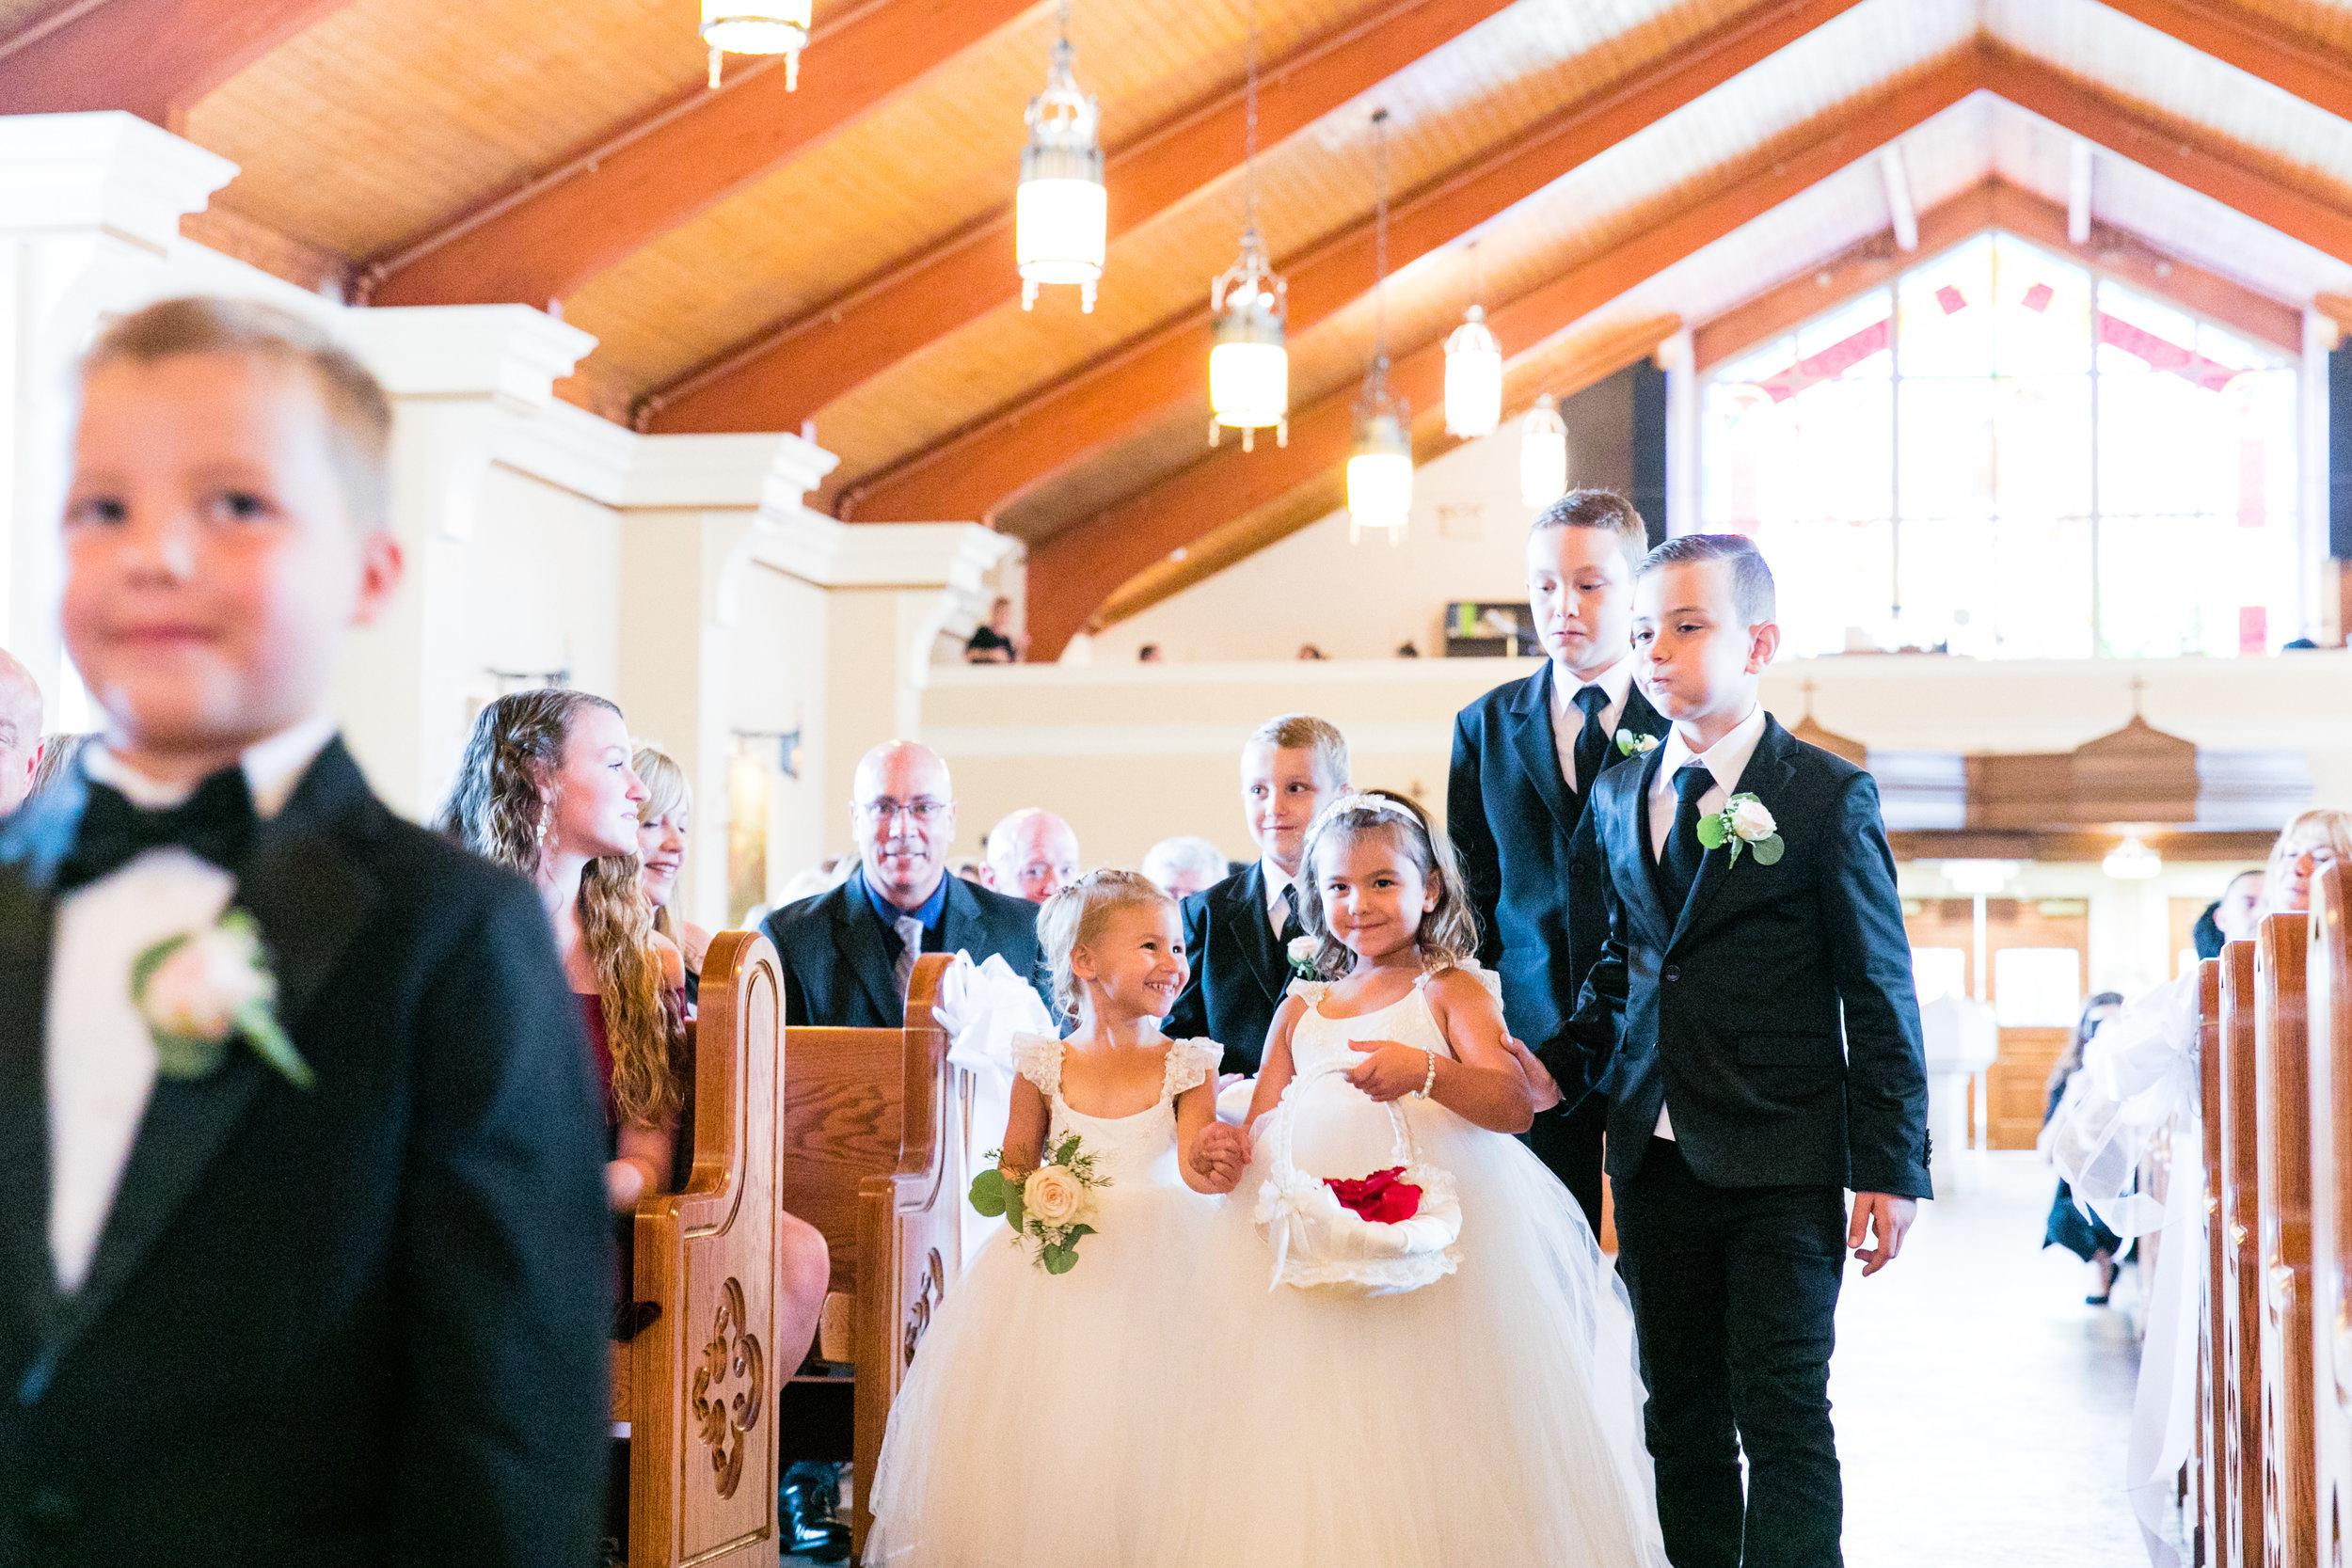 Sam and Mikes Wedding Photos - Pen Ryn Estate - 281.jpg